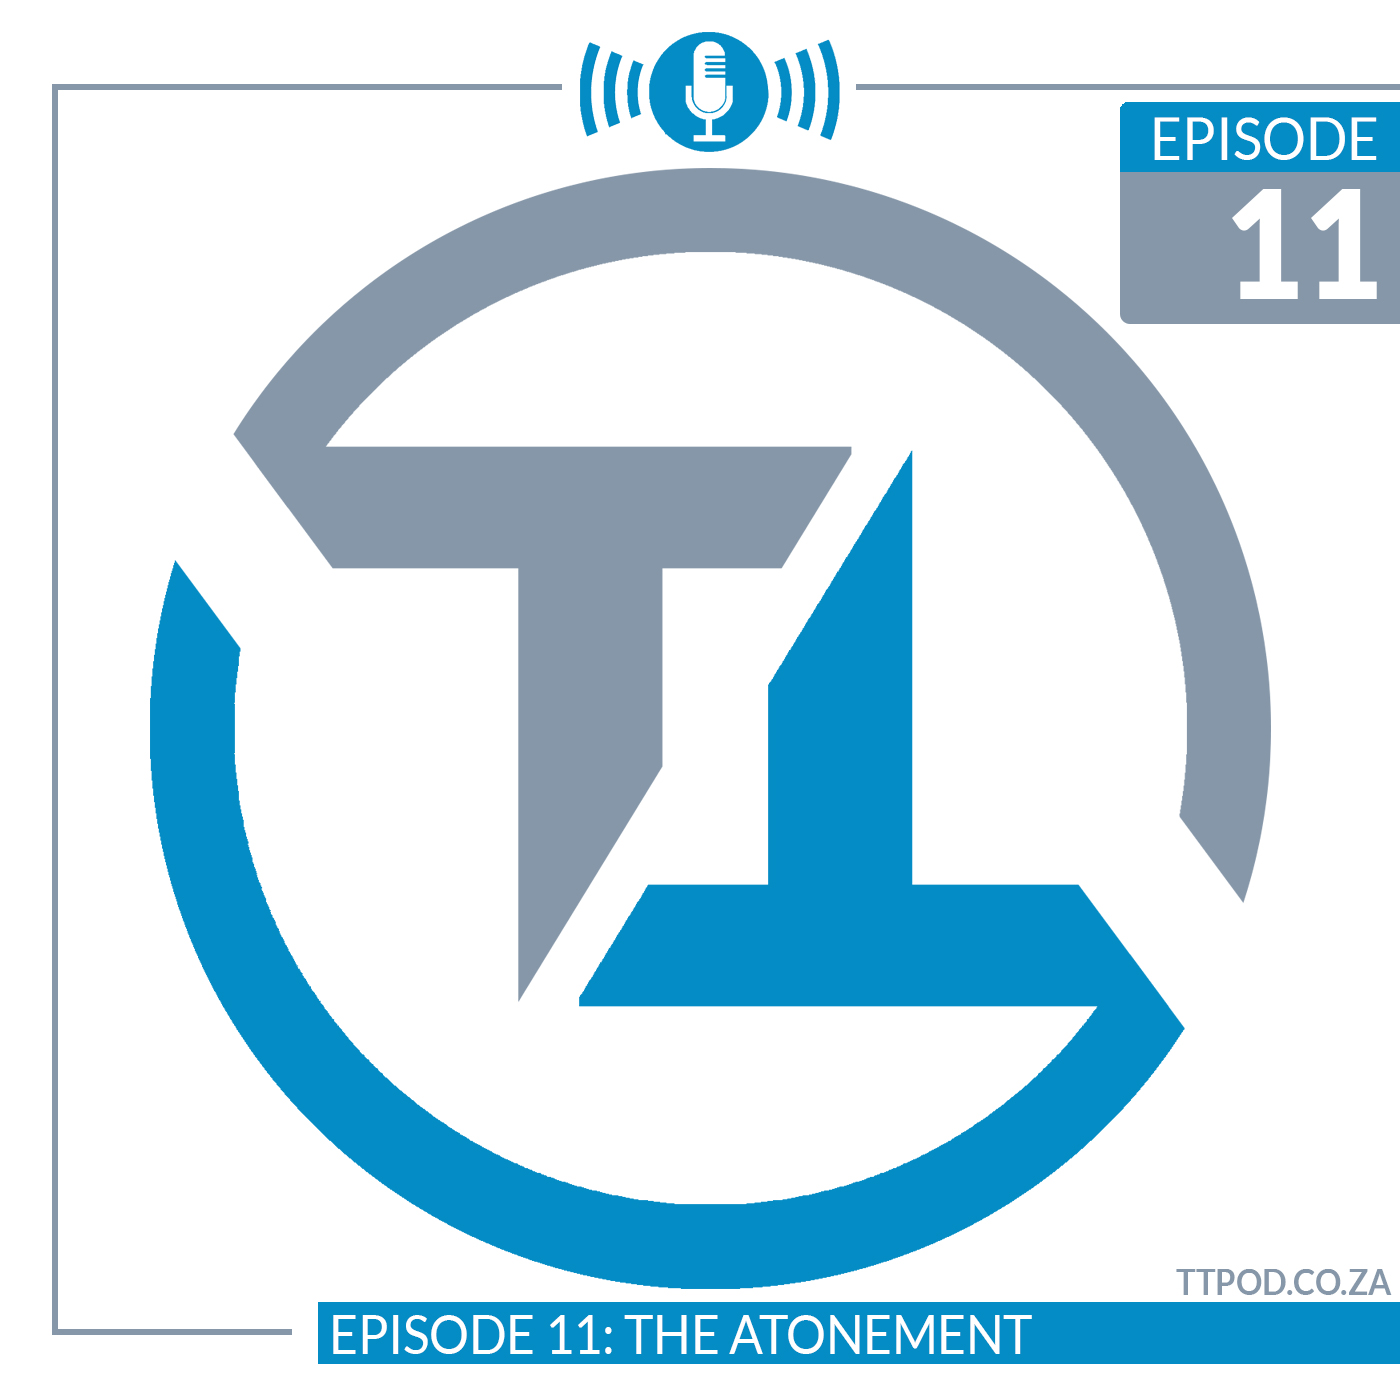 Episode 11: The Atonement